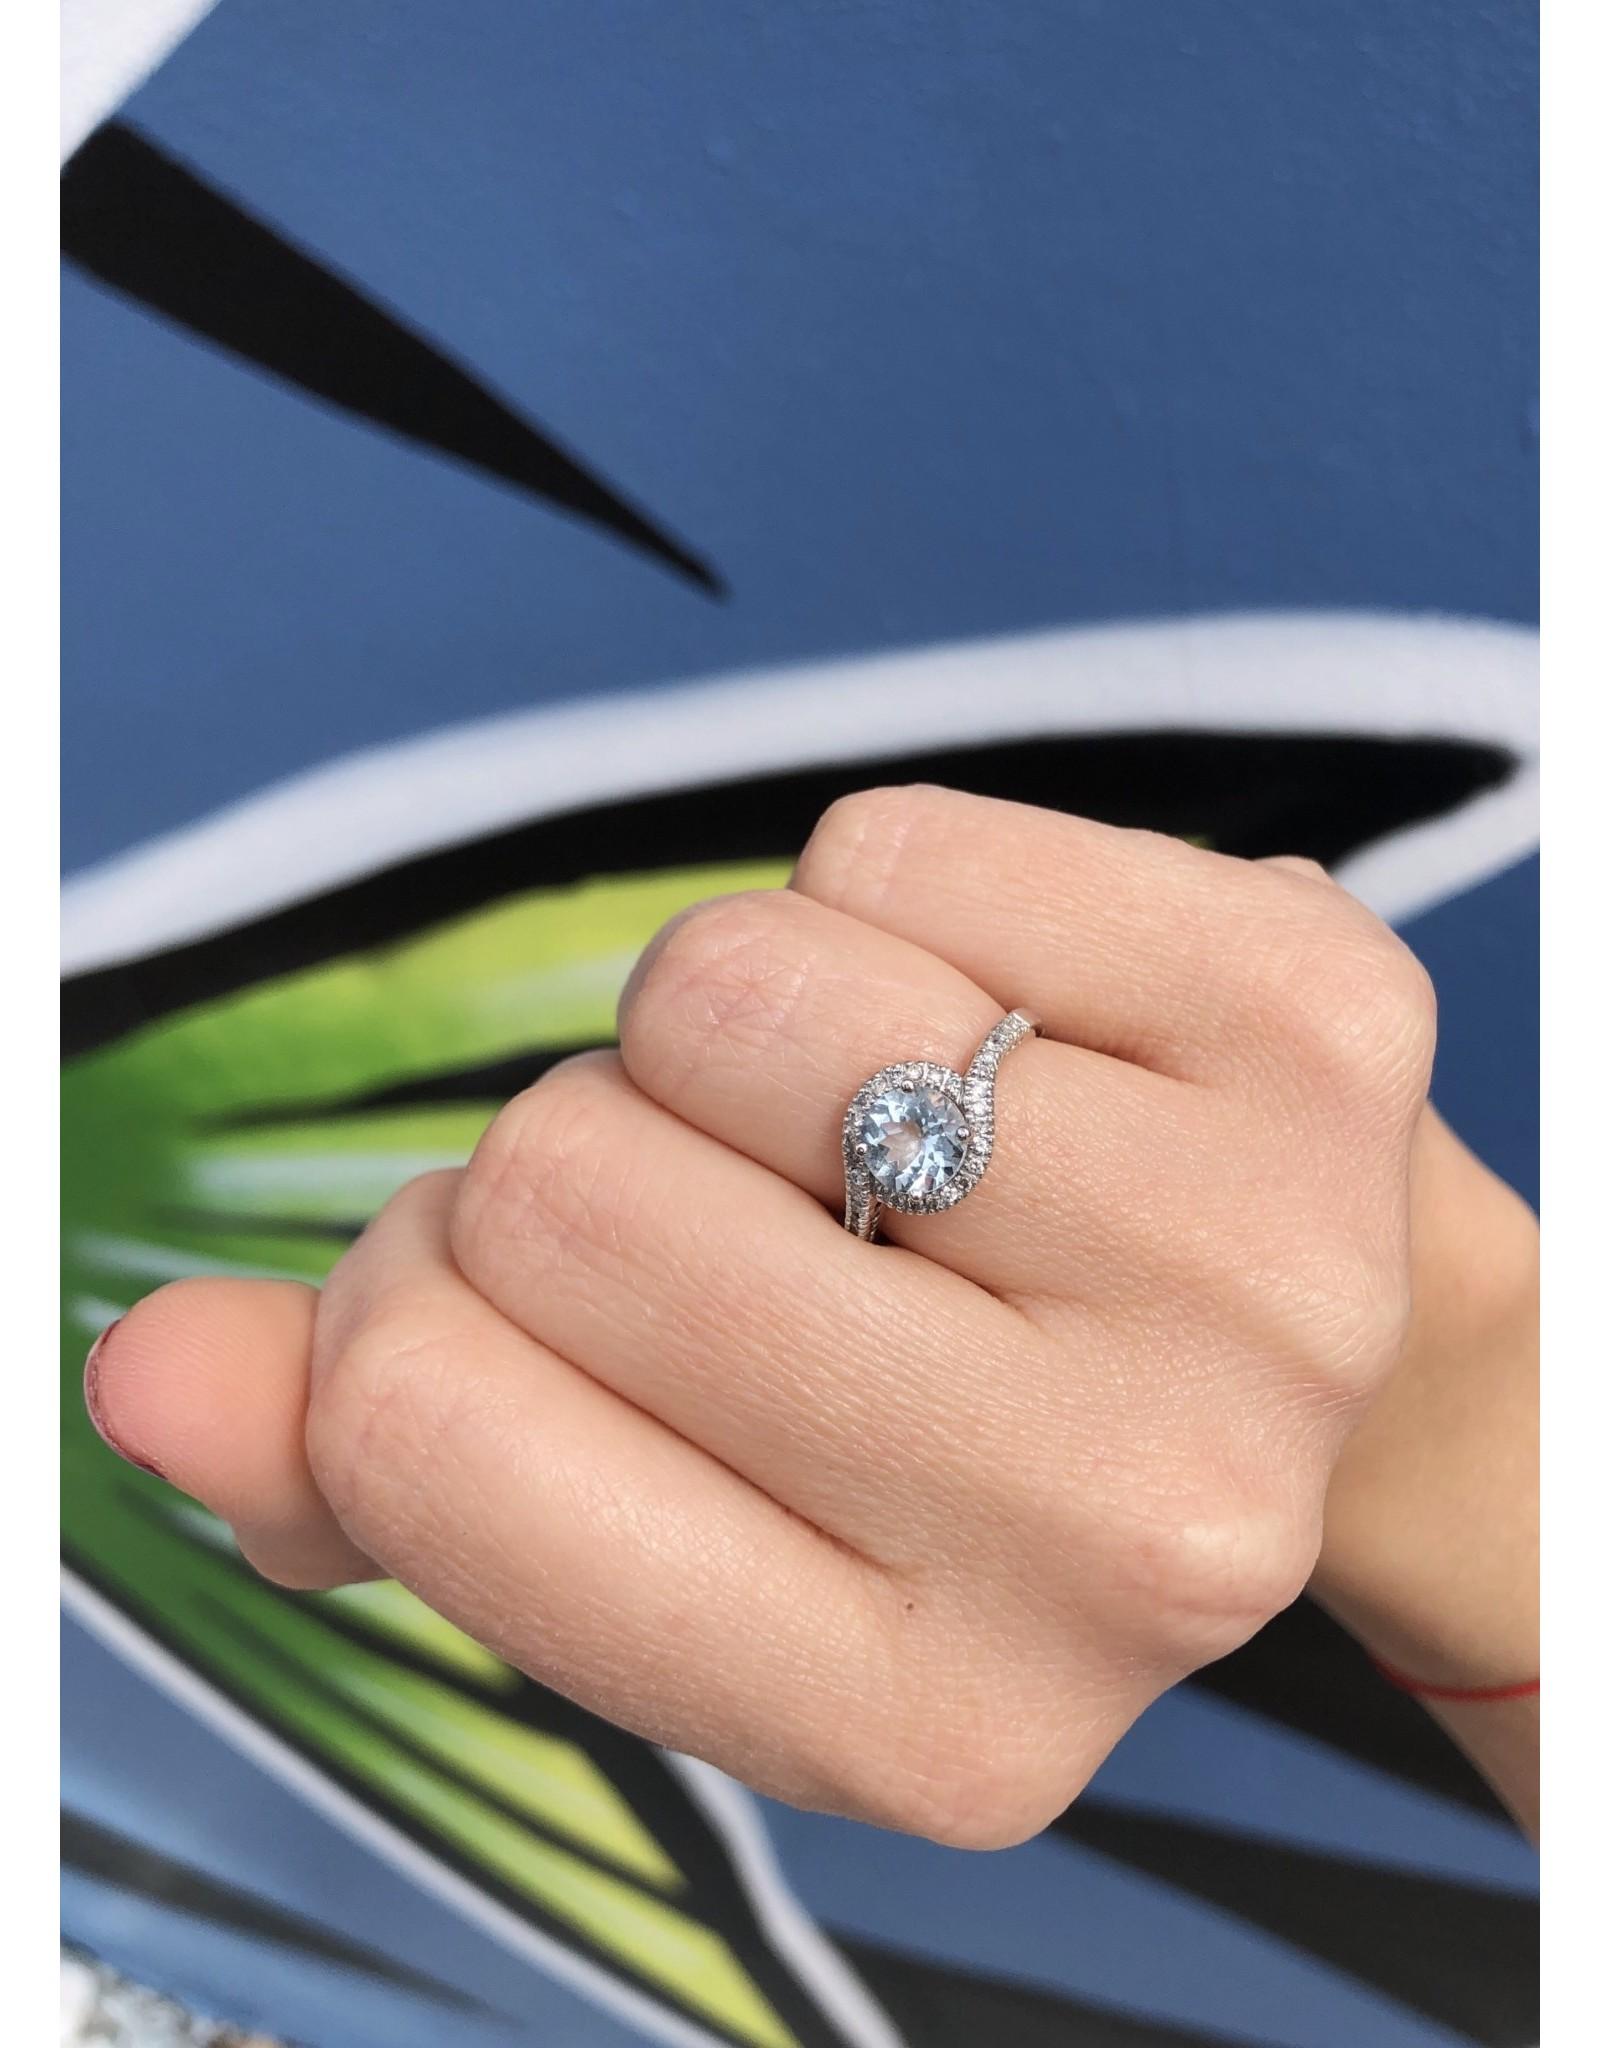 14K White Gold Round Aquamarine and Diamond Ring, AQ: 0.92cts  D: 0.19cts